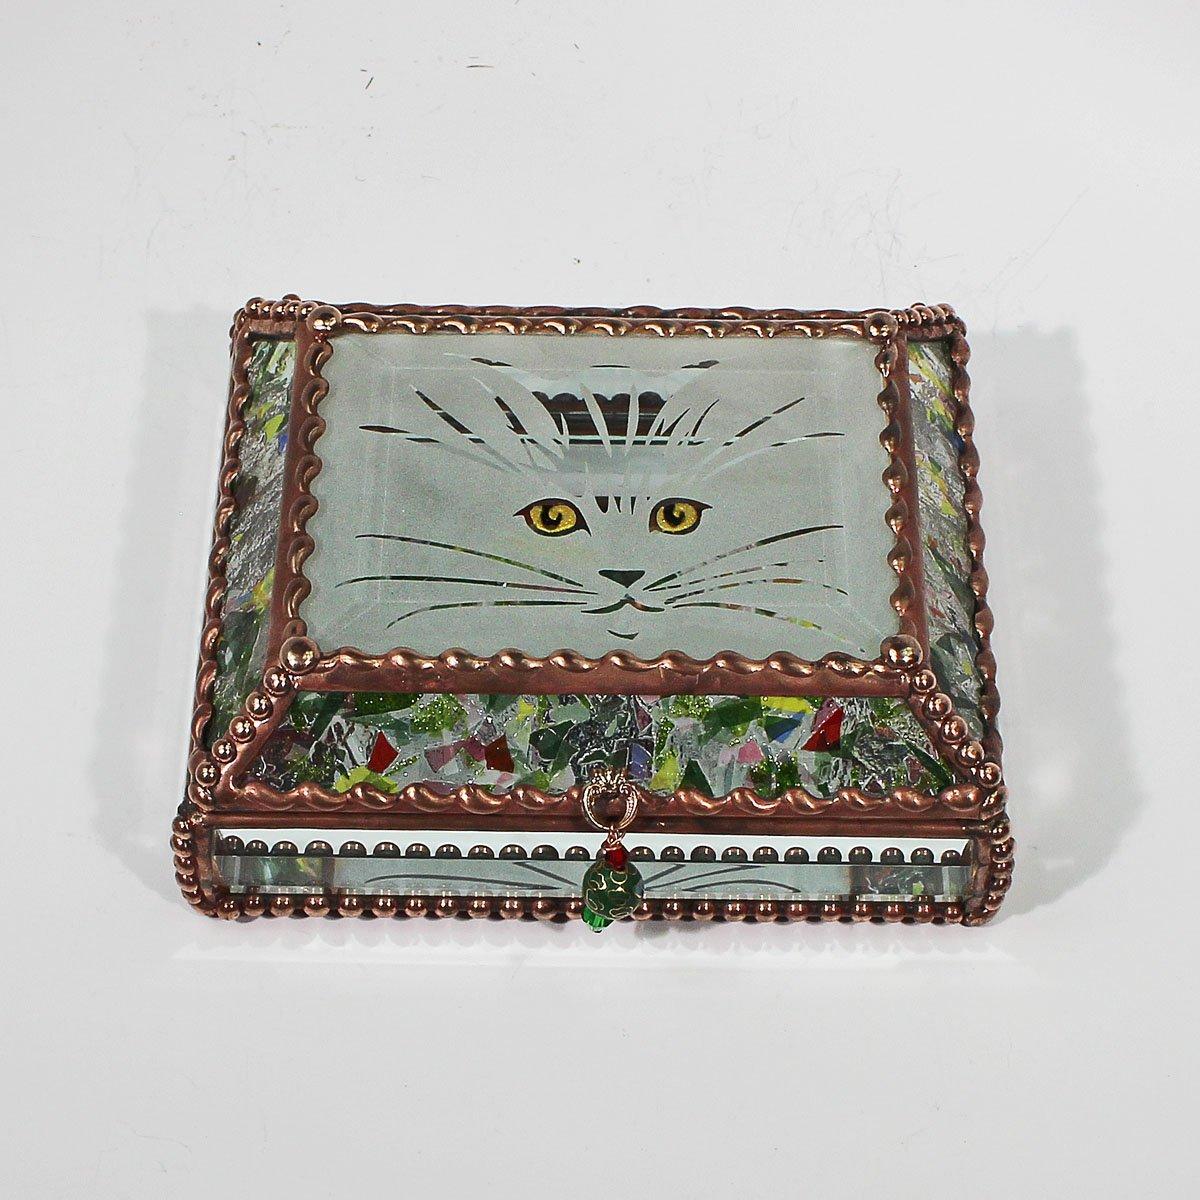 Kitten, Cat Eyes, Stained Glass Jewelry Box, Presentation Box, Keepsake Box, Glass Jewels, Swarovski Crystals, USA Made